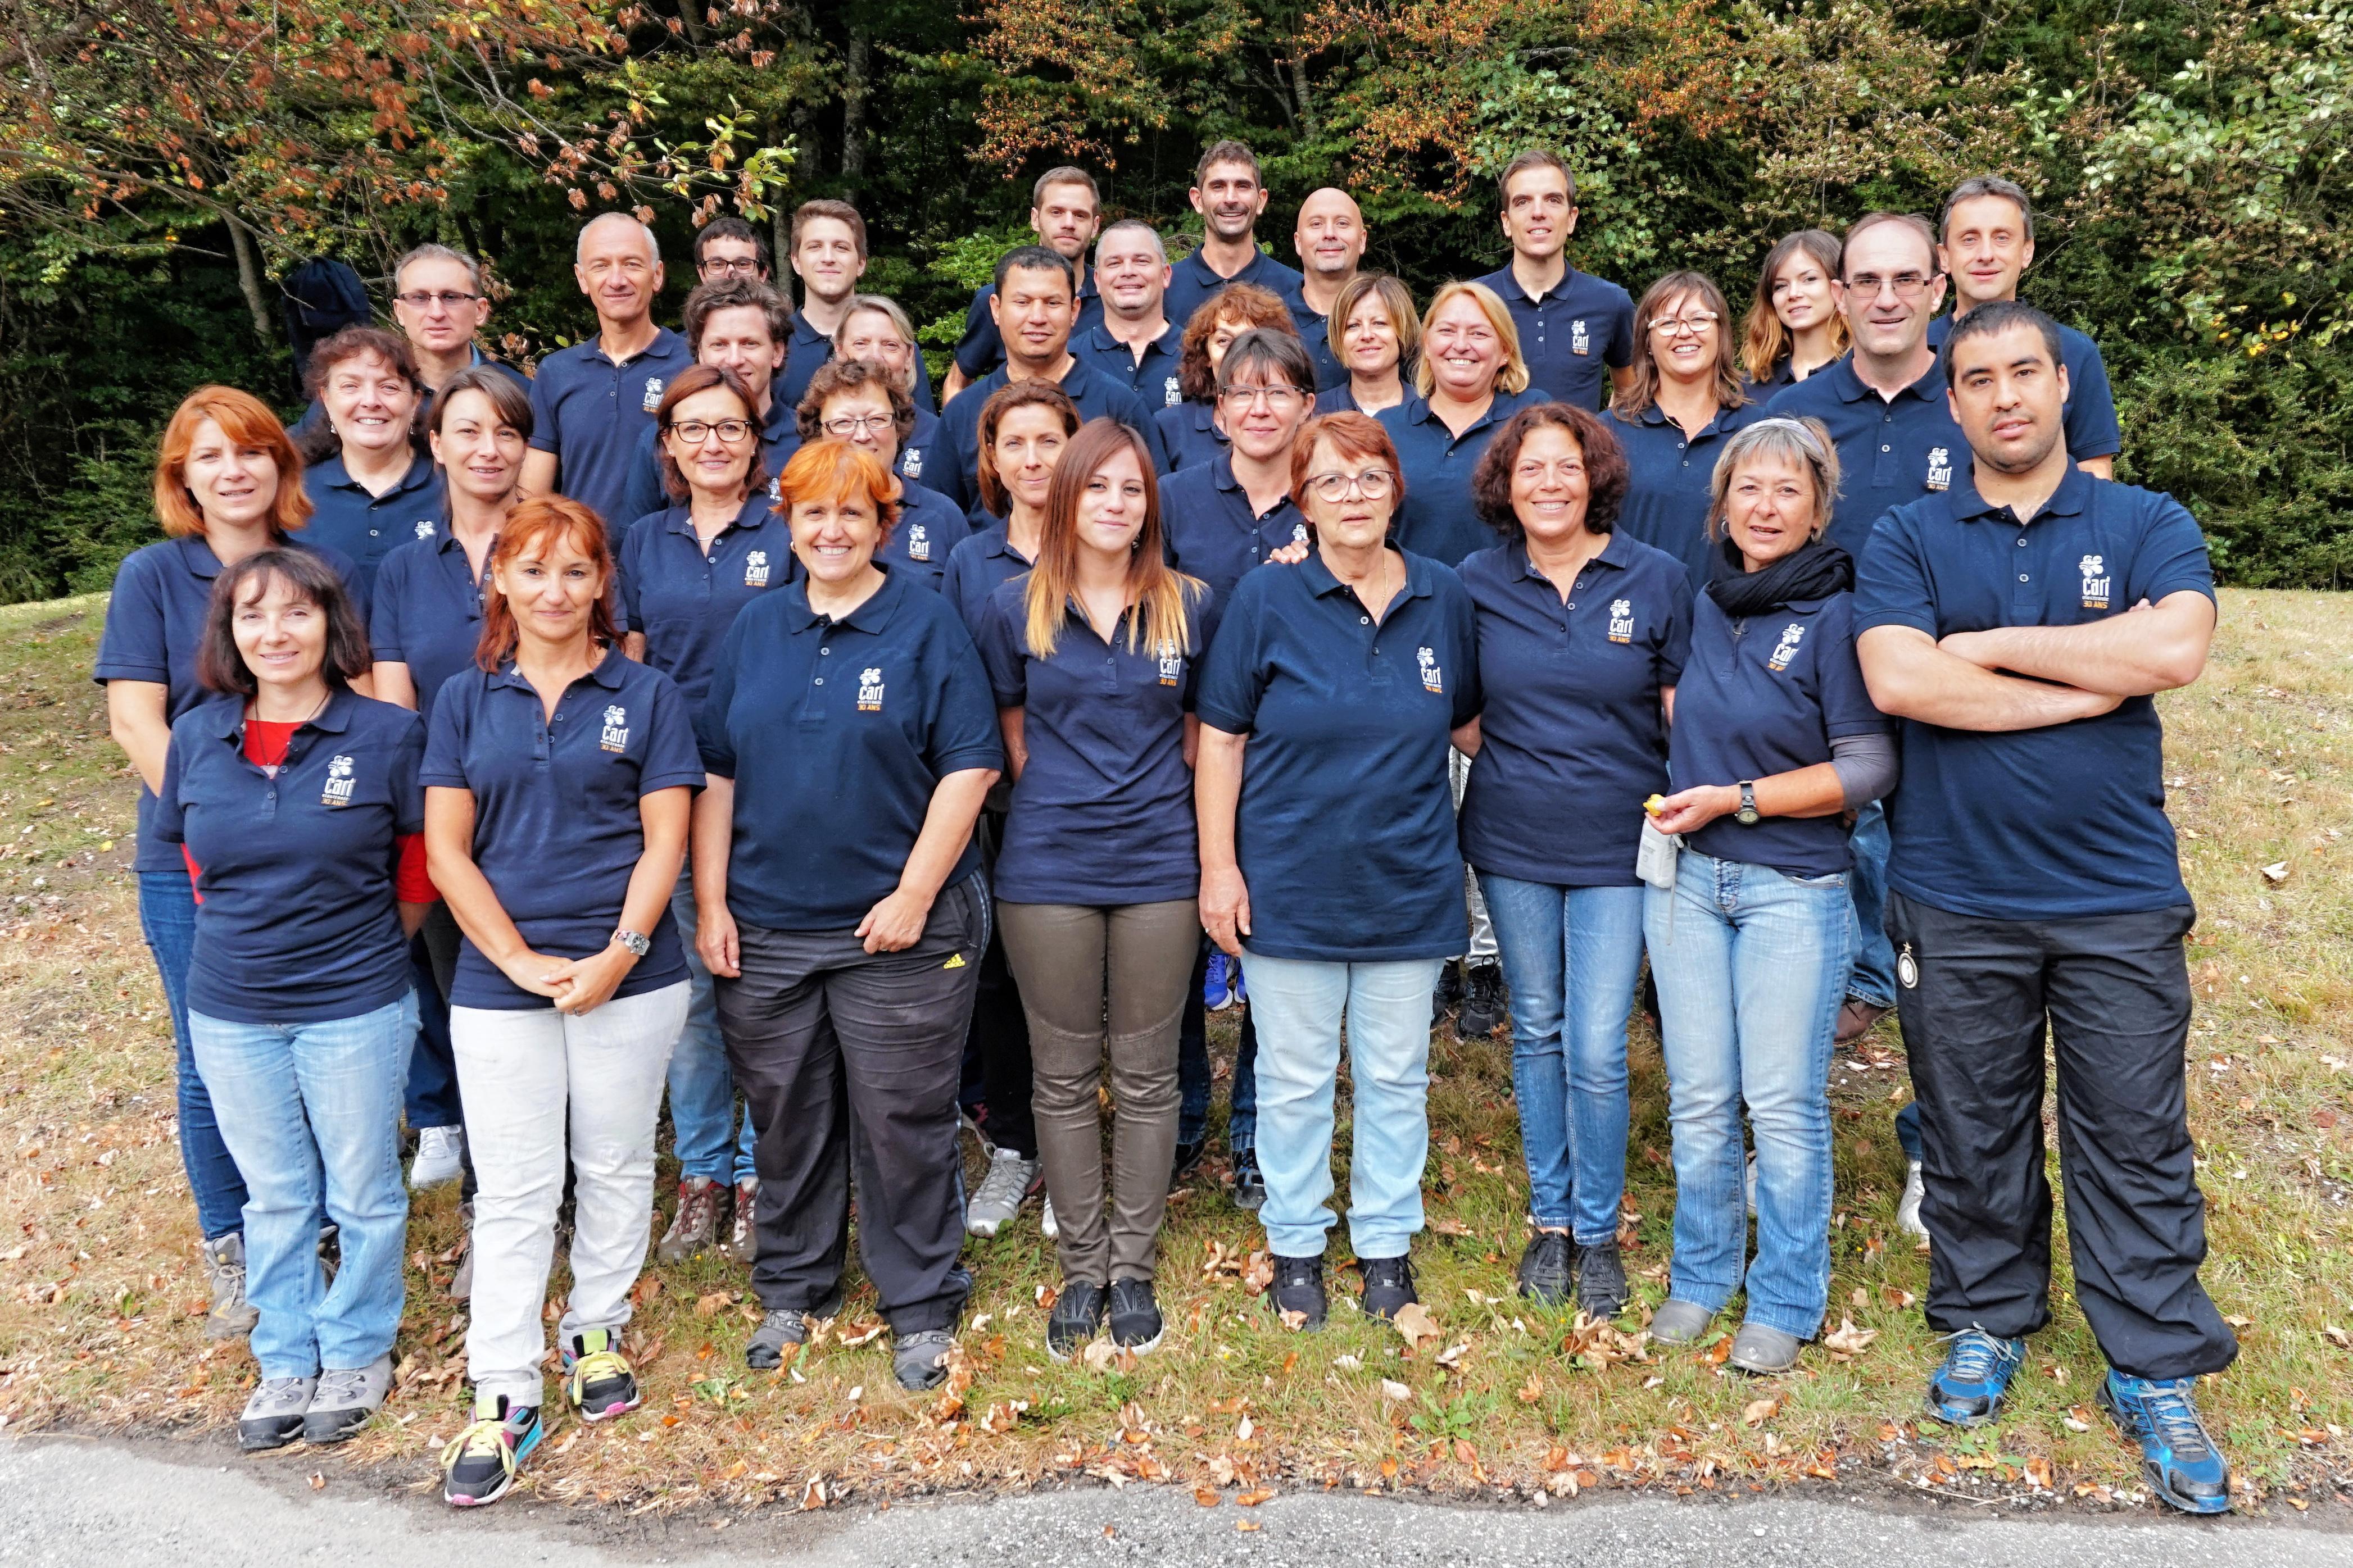 L'équipe de CARI Electronic, installée à Rovaltain - Valence TGV